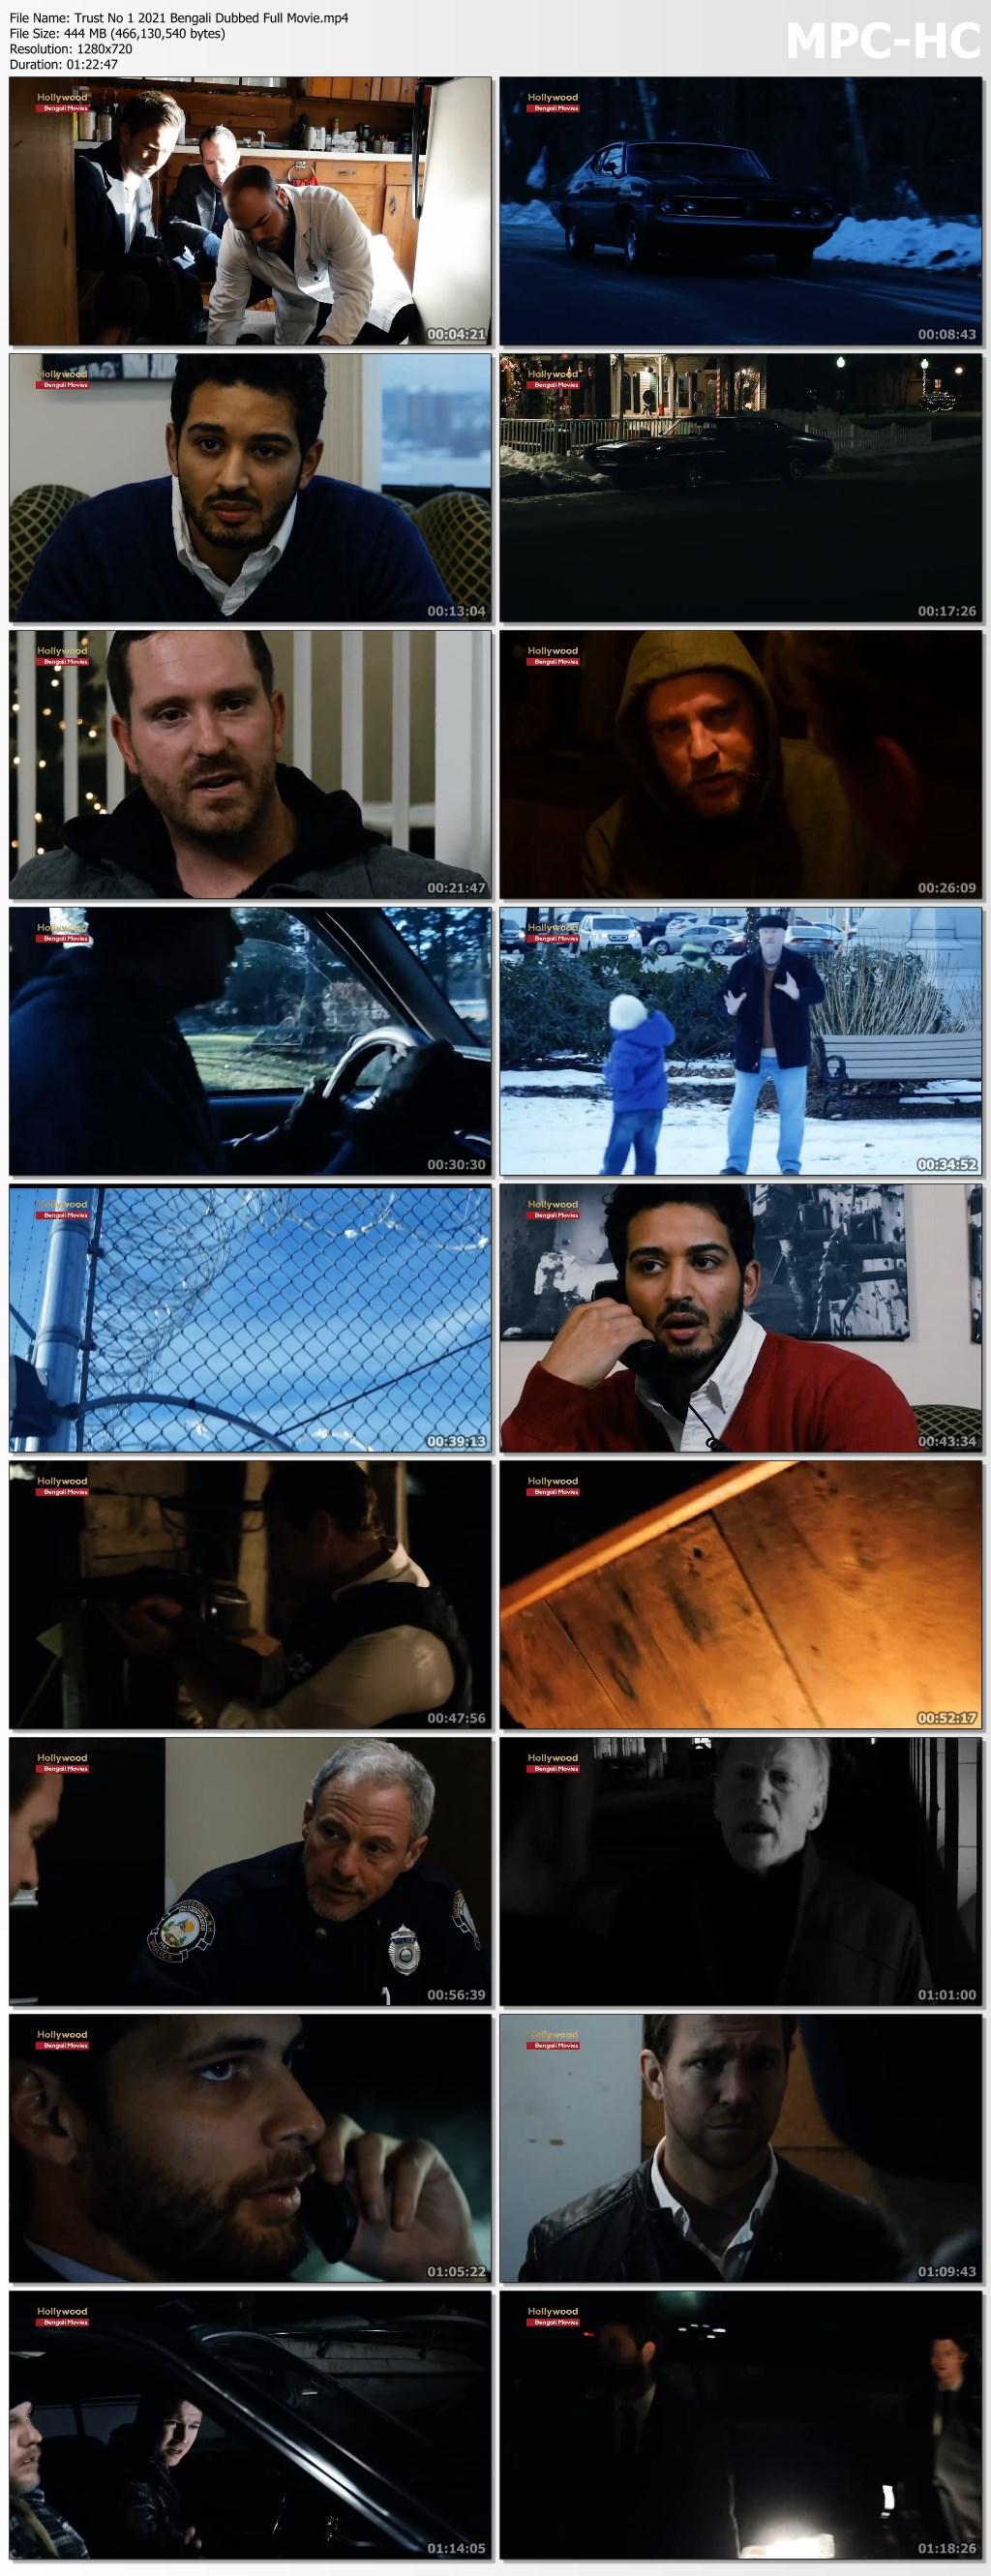 Trust No 1 2021 Bengali Dubbed Full Movie.mp4 thumbs